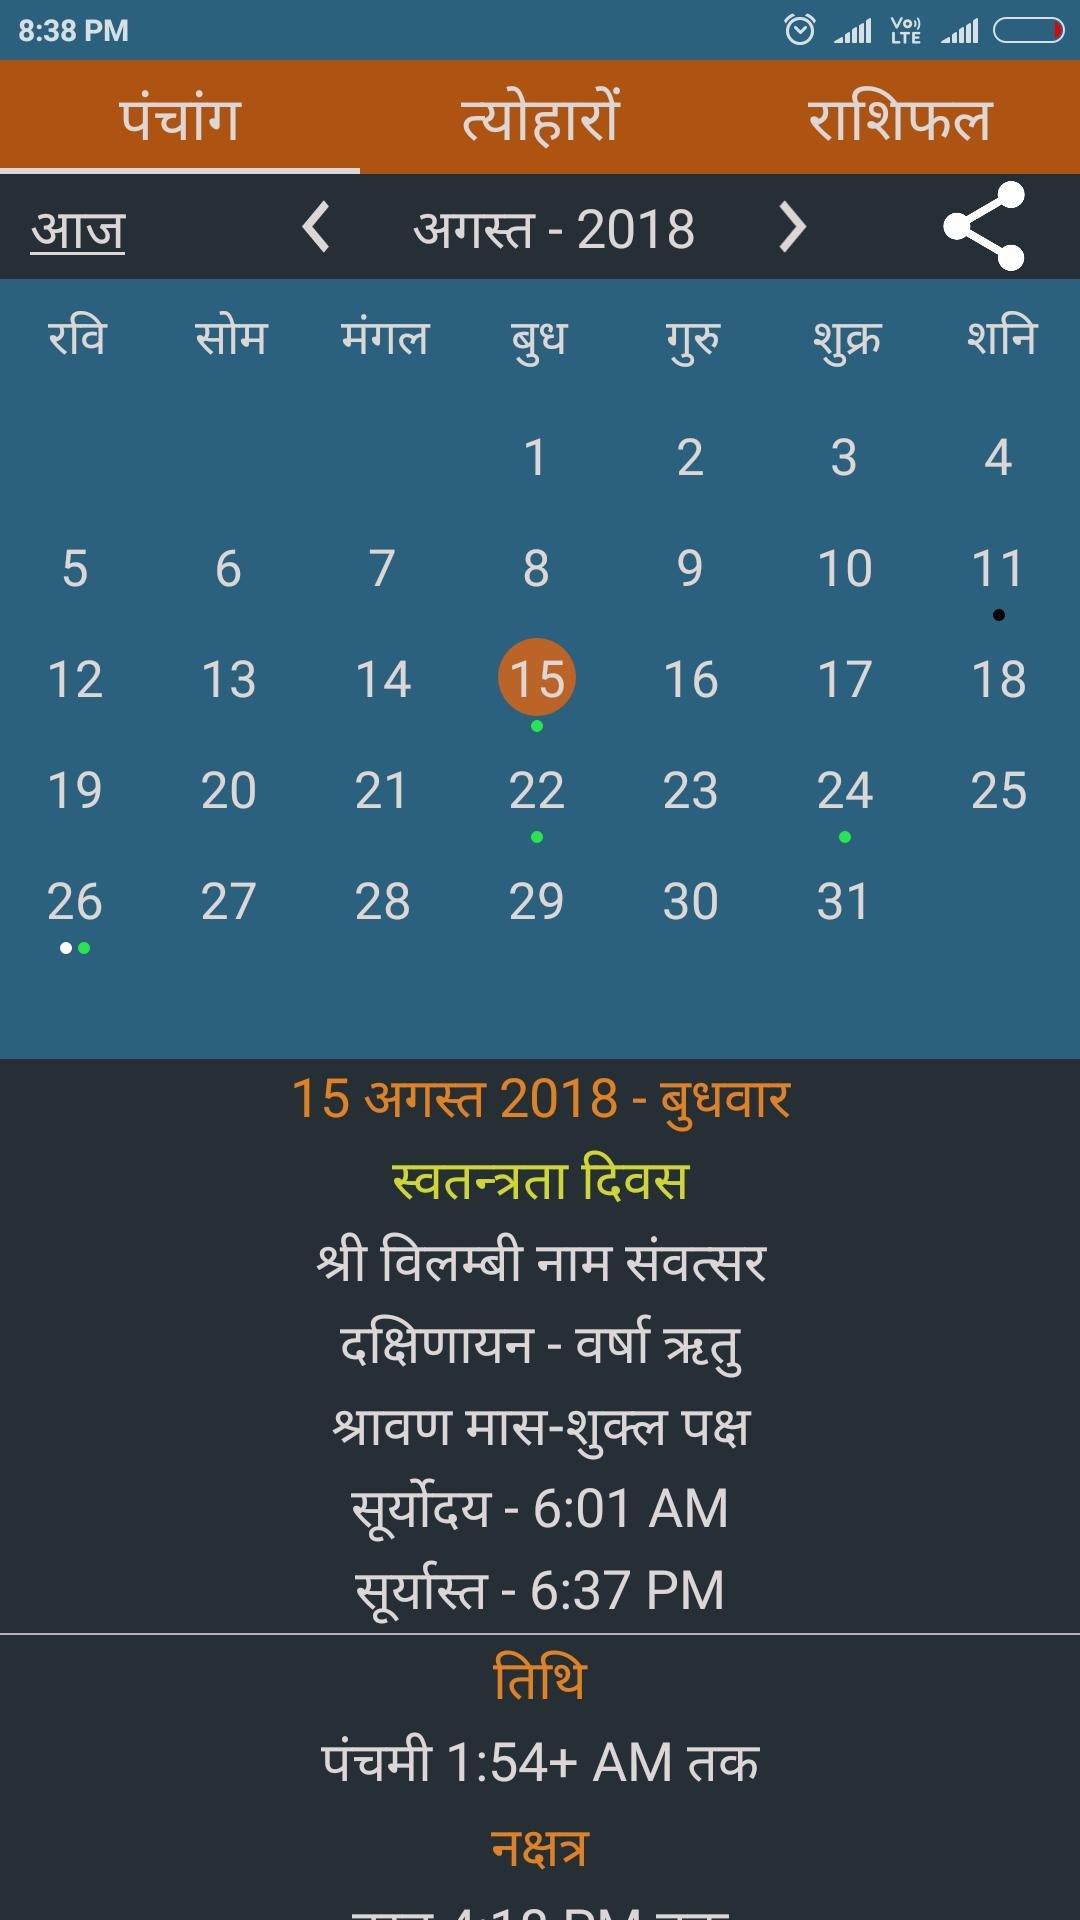 Hindi Calendar 2019 – Rashifal Panchang Horoscope For Android – Apk Calendar 2019 Rashifal